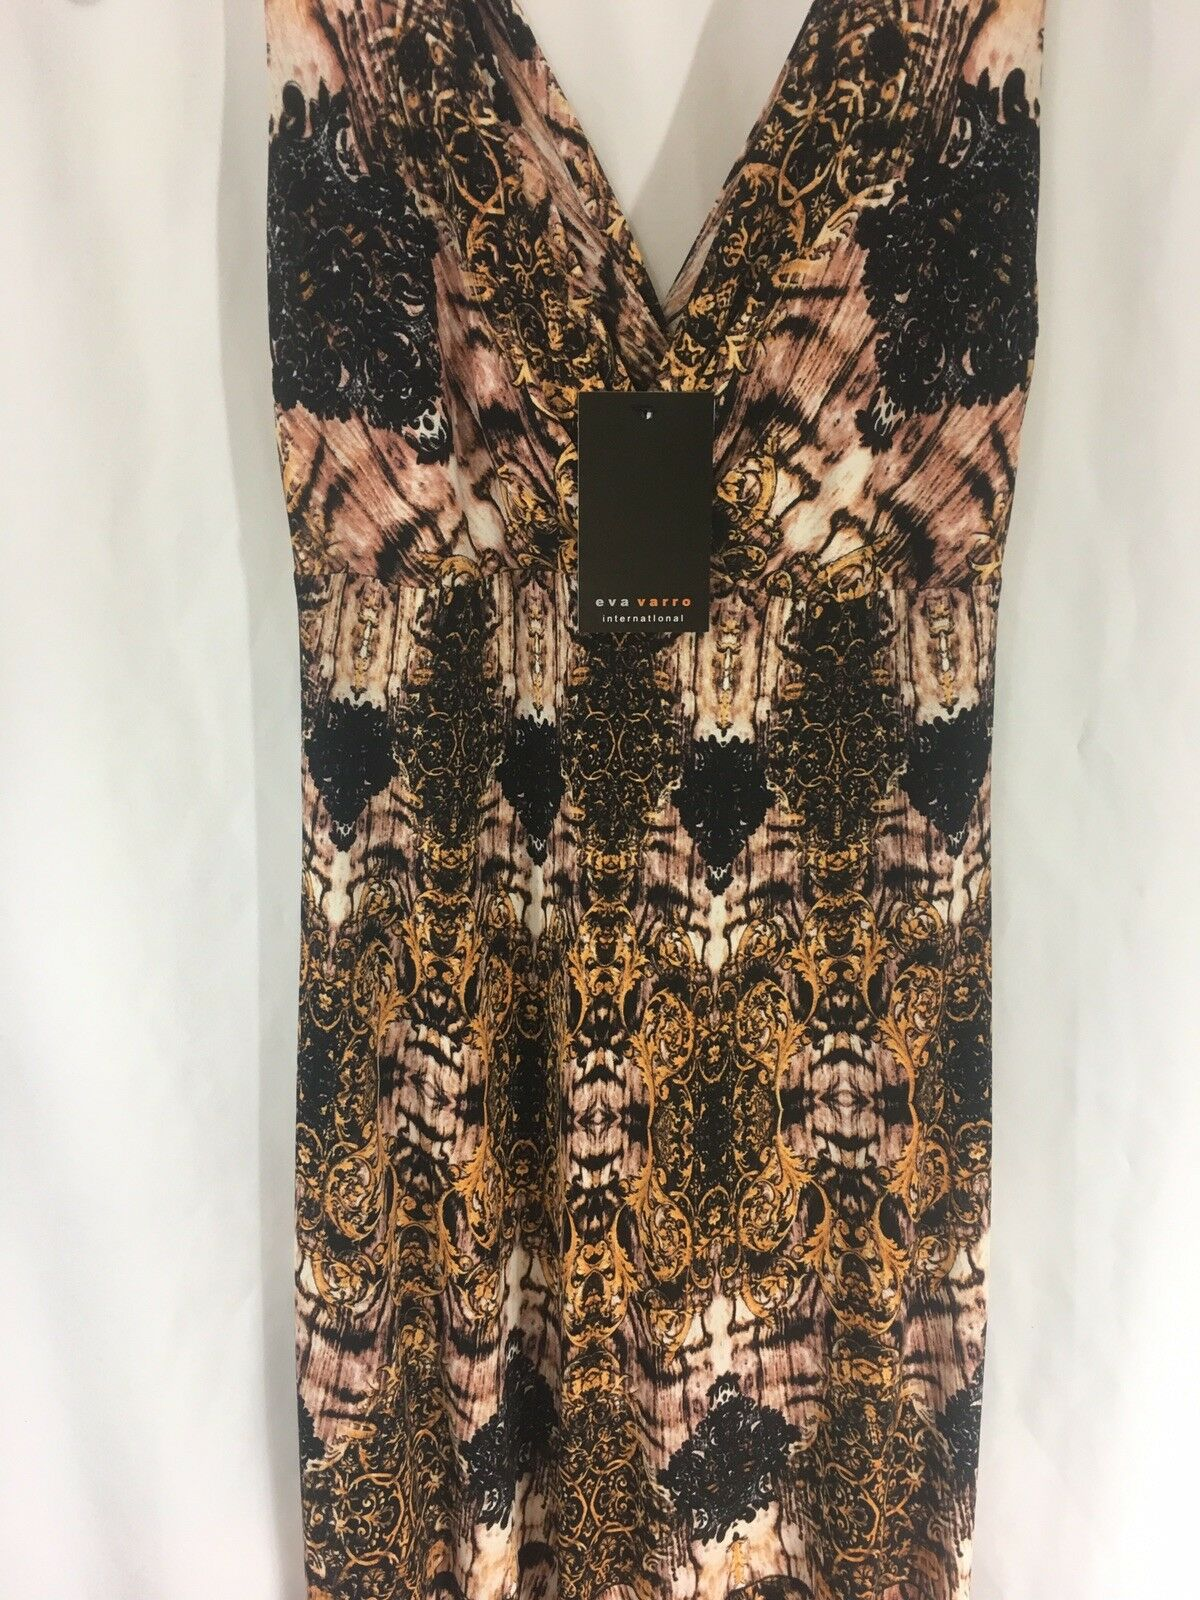 EVA VARRO NWT Long Maxi Dress Größe XS NEW Made In USA